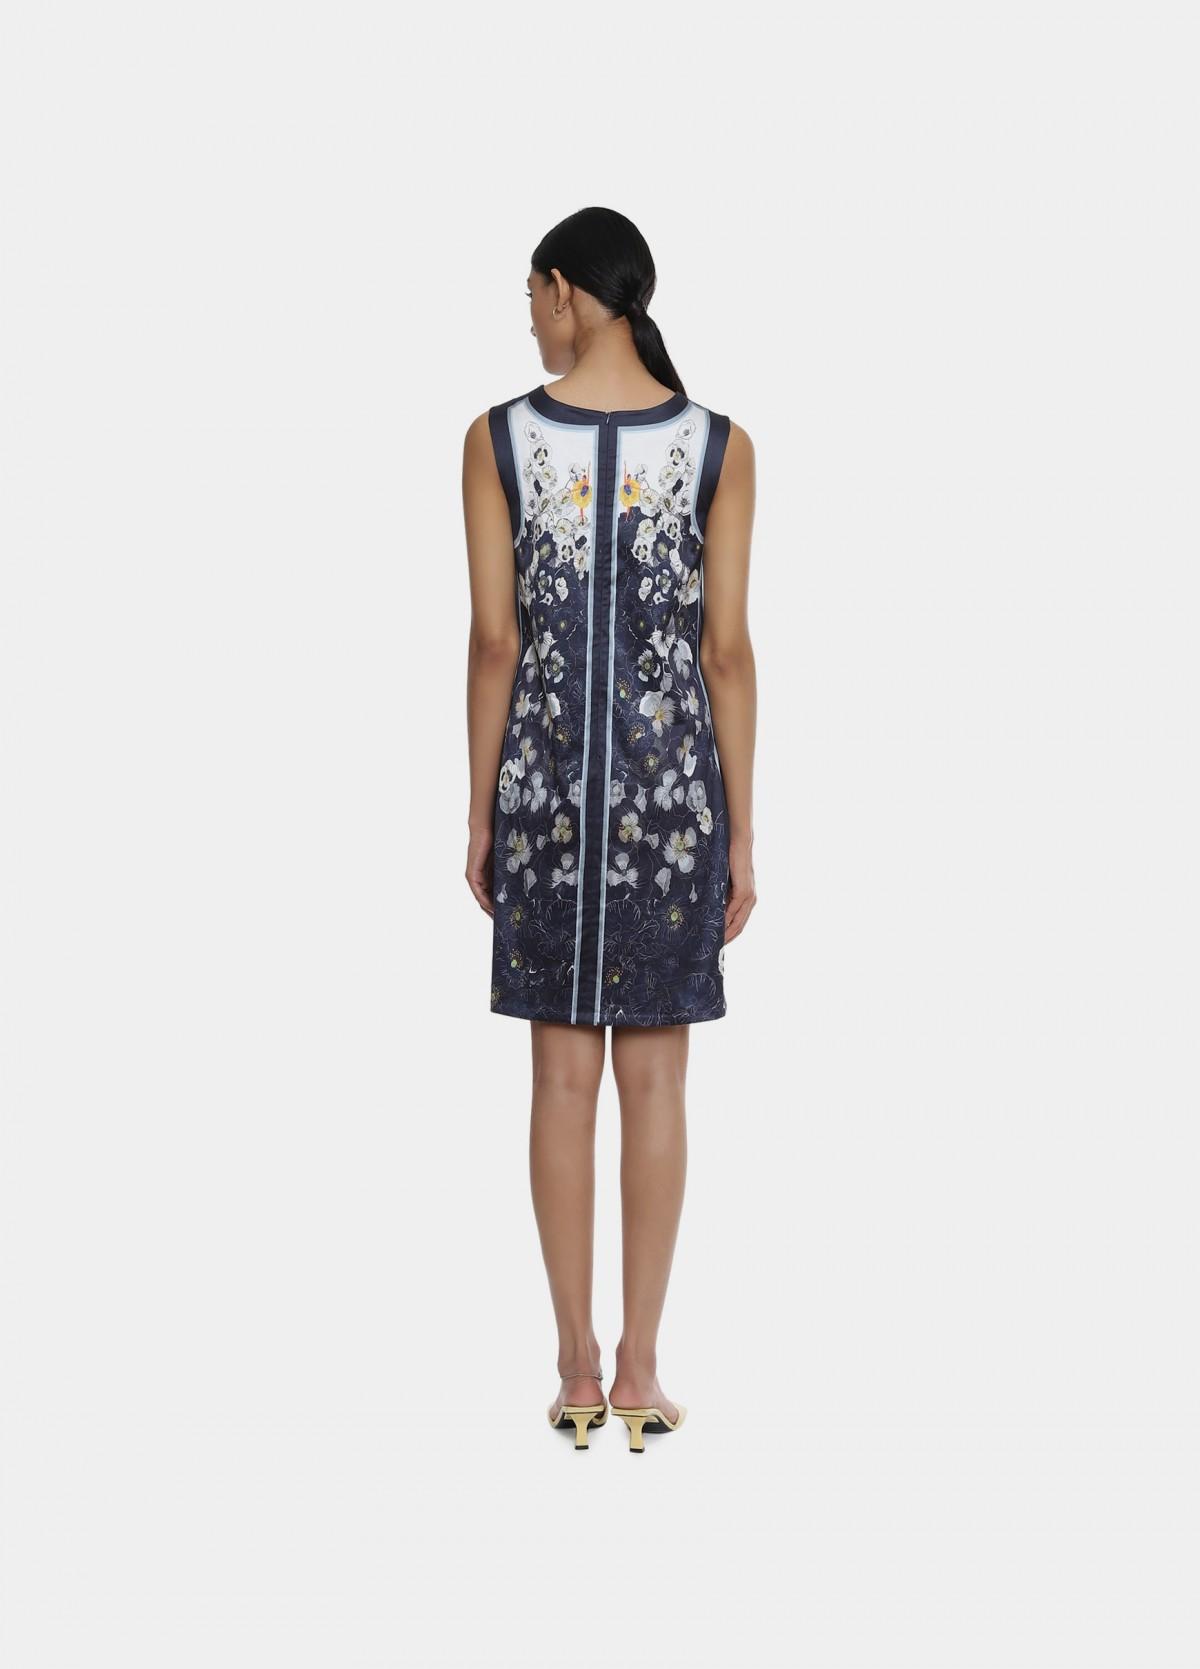 The Peggy Dress